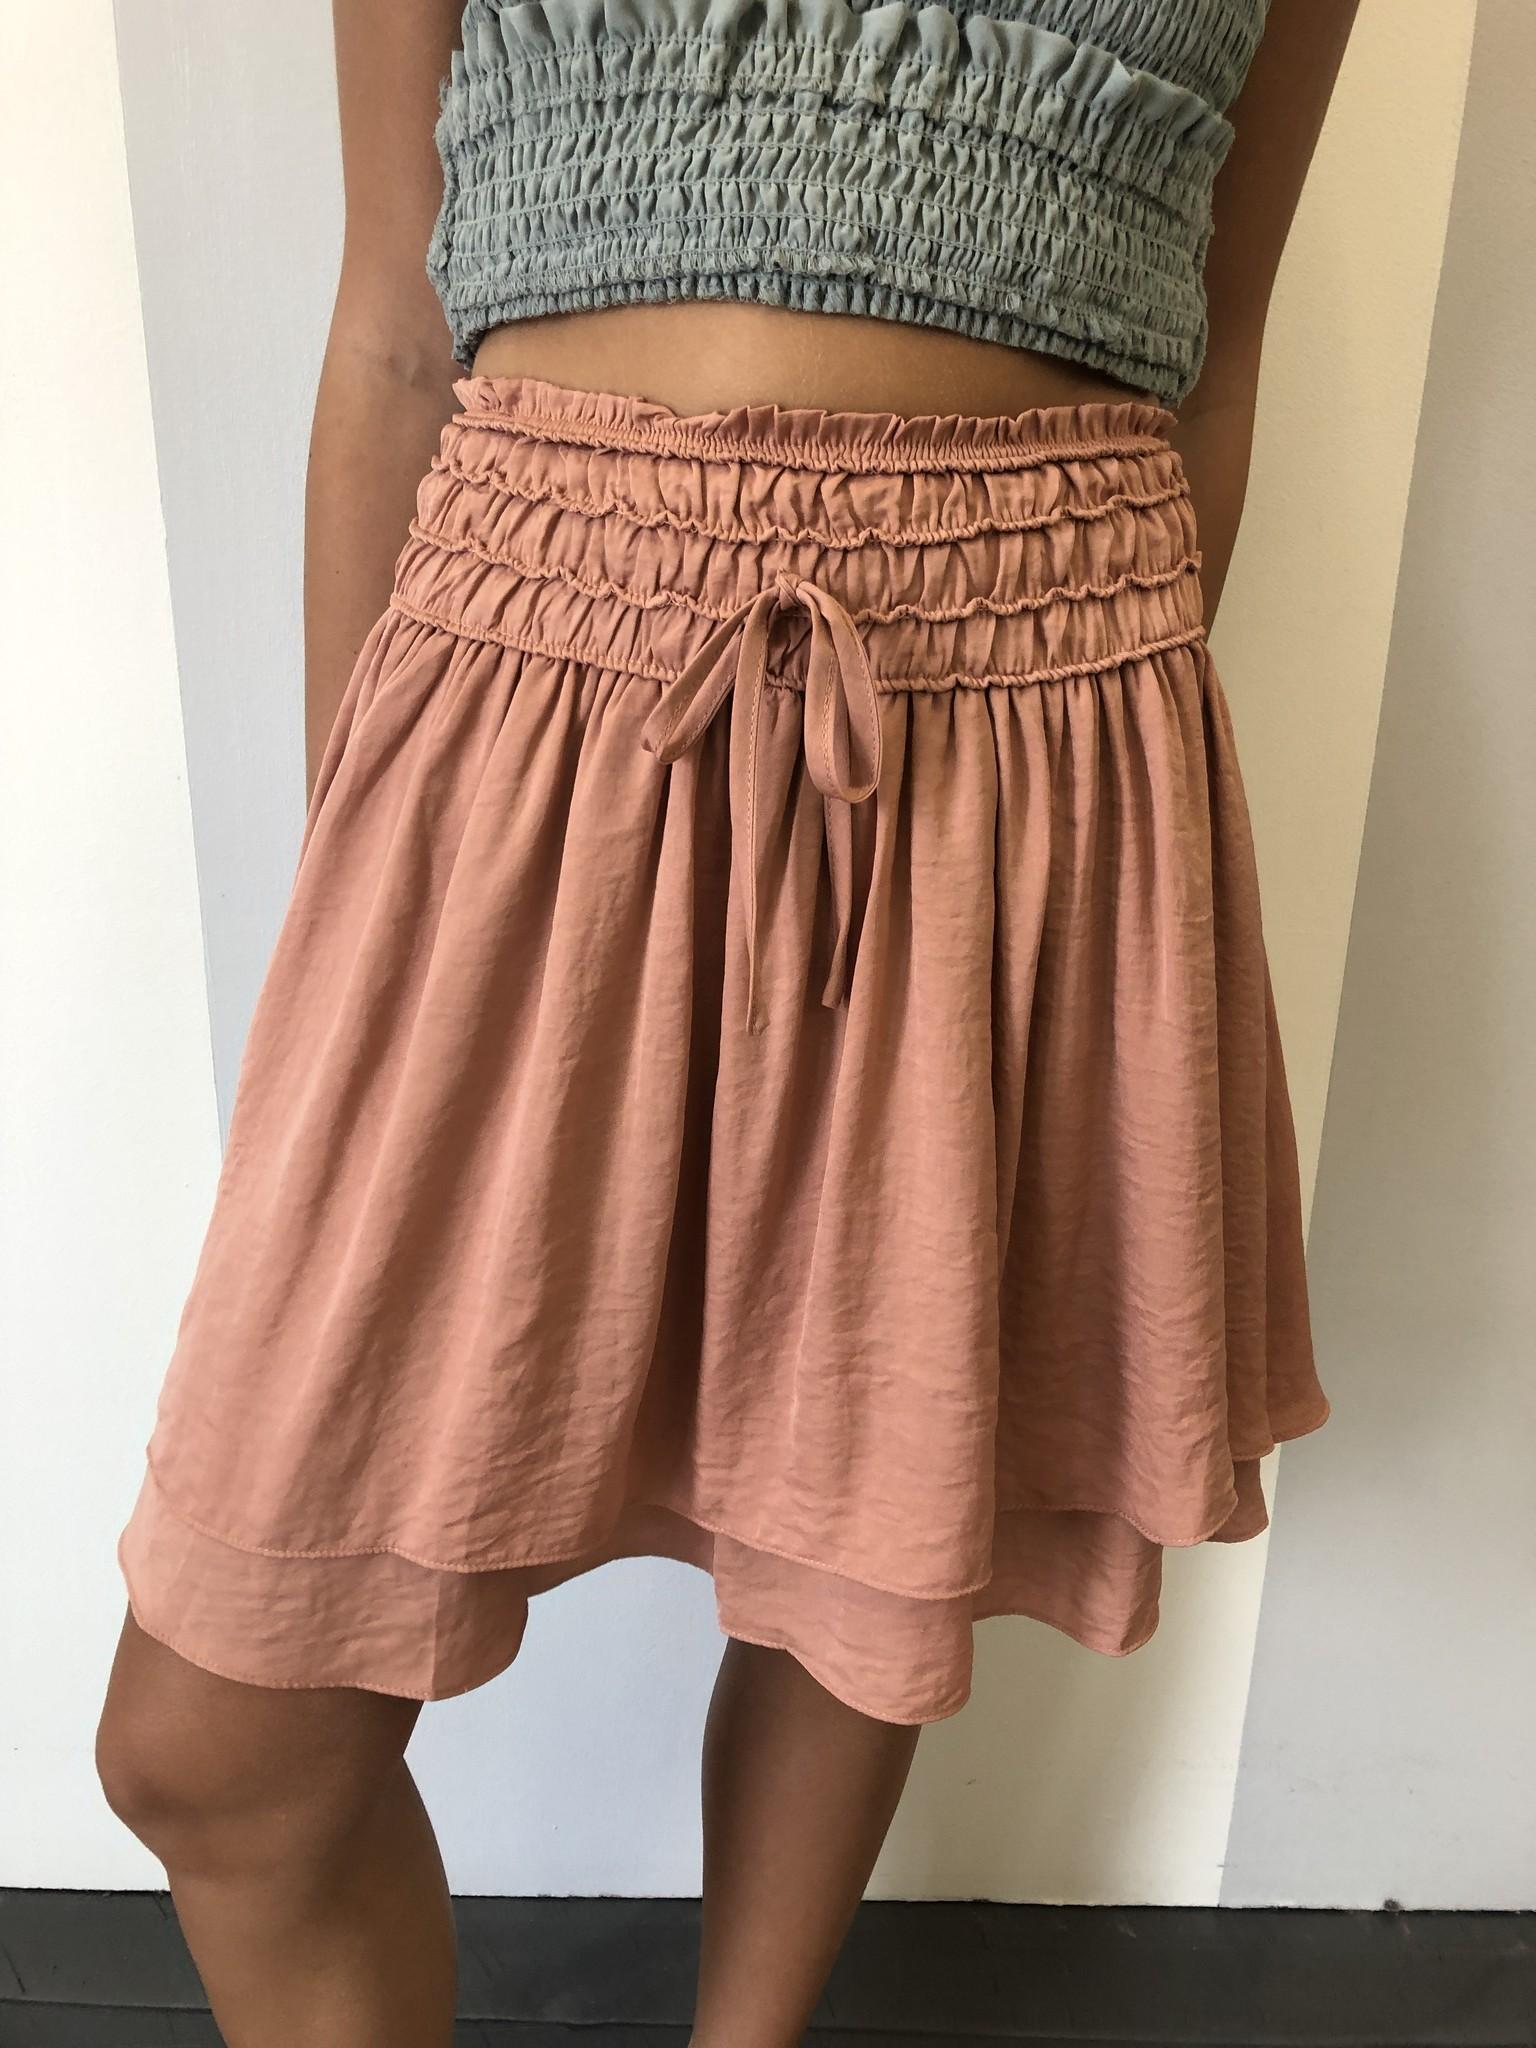 Dusty Peach Ruffle Skirt